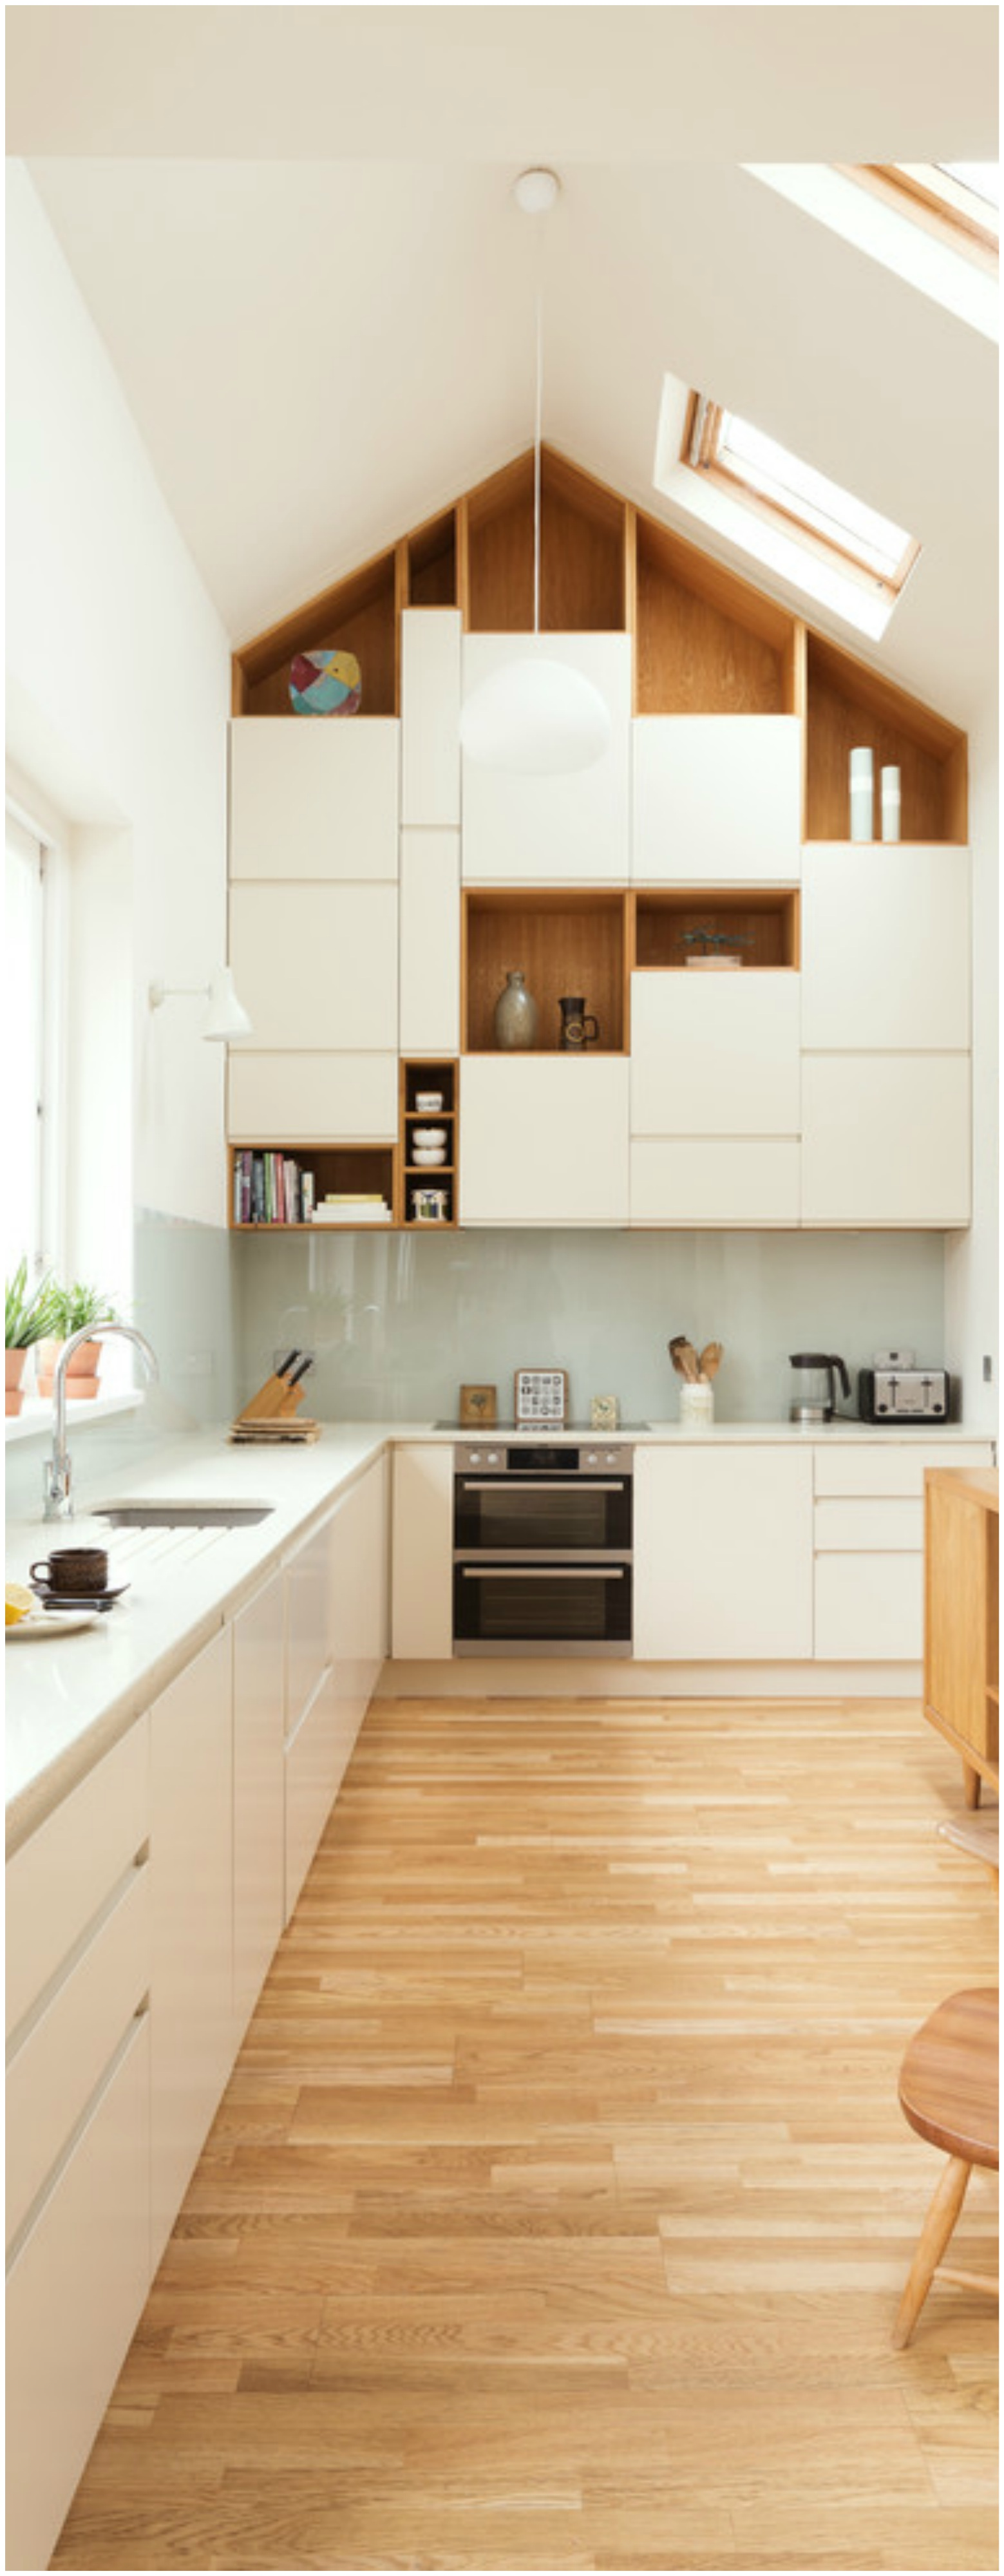 Attic Kitchen With Unique Cabinets Till Ceiling Thewowdecor